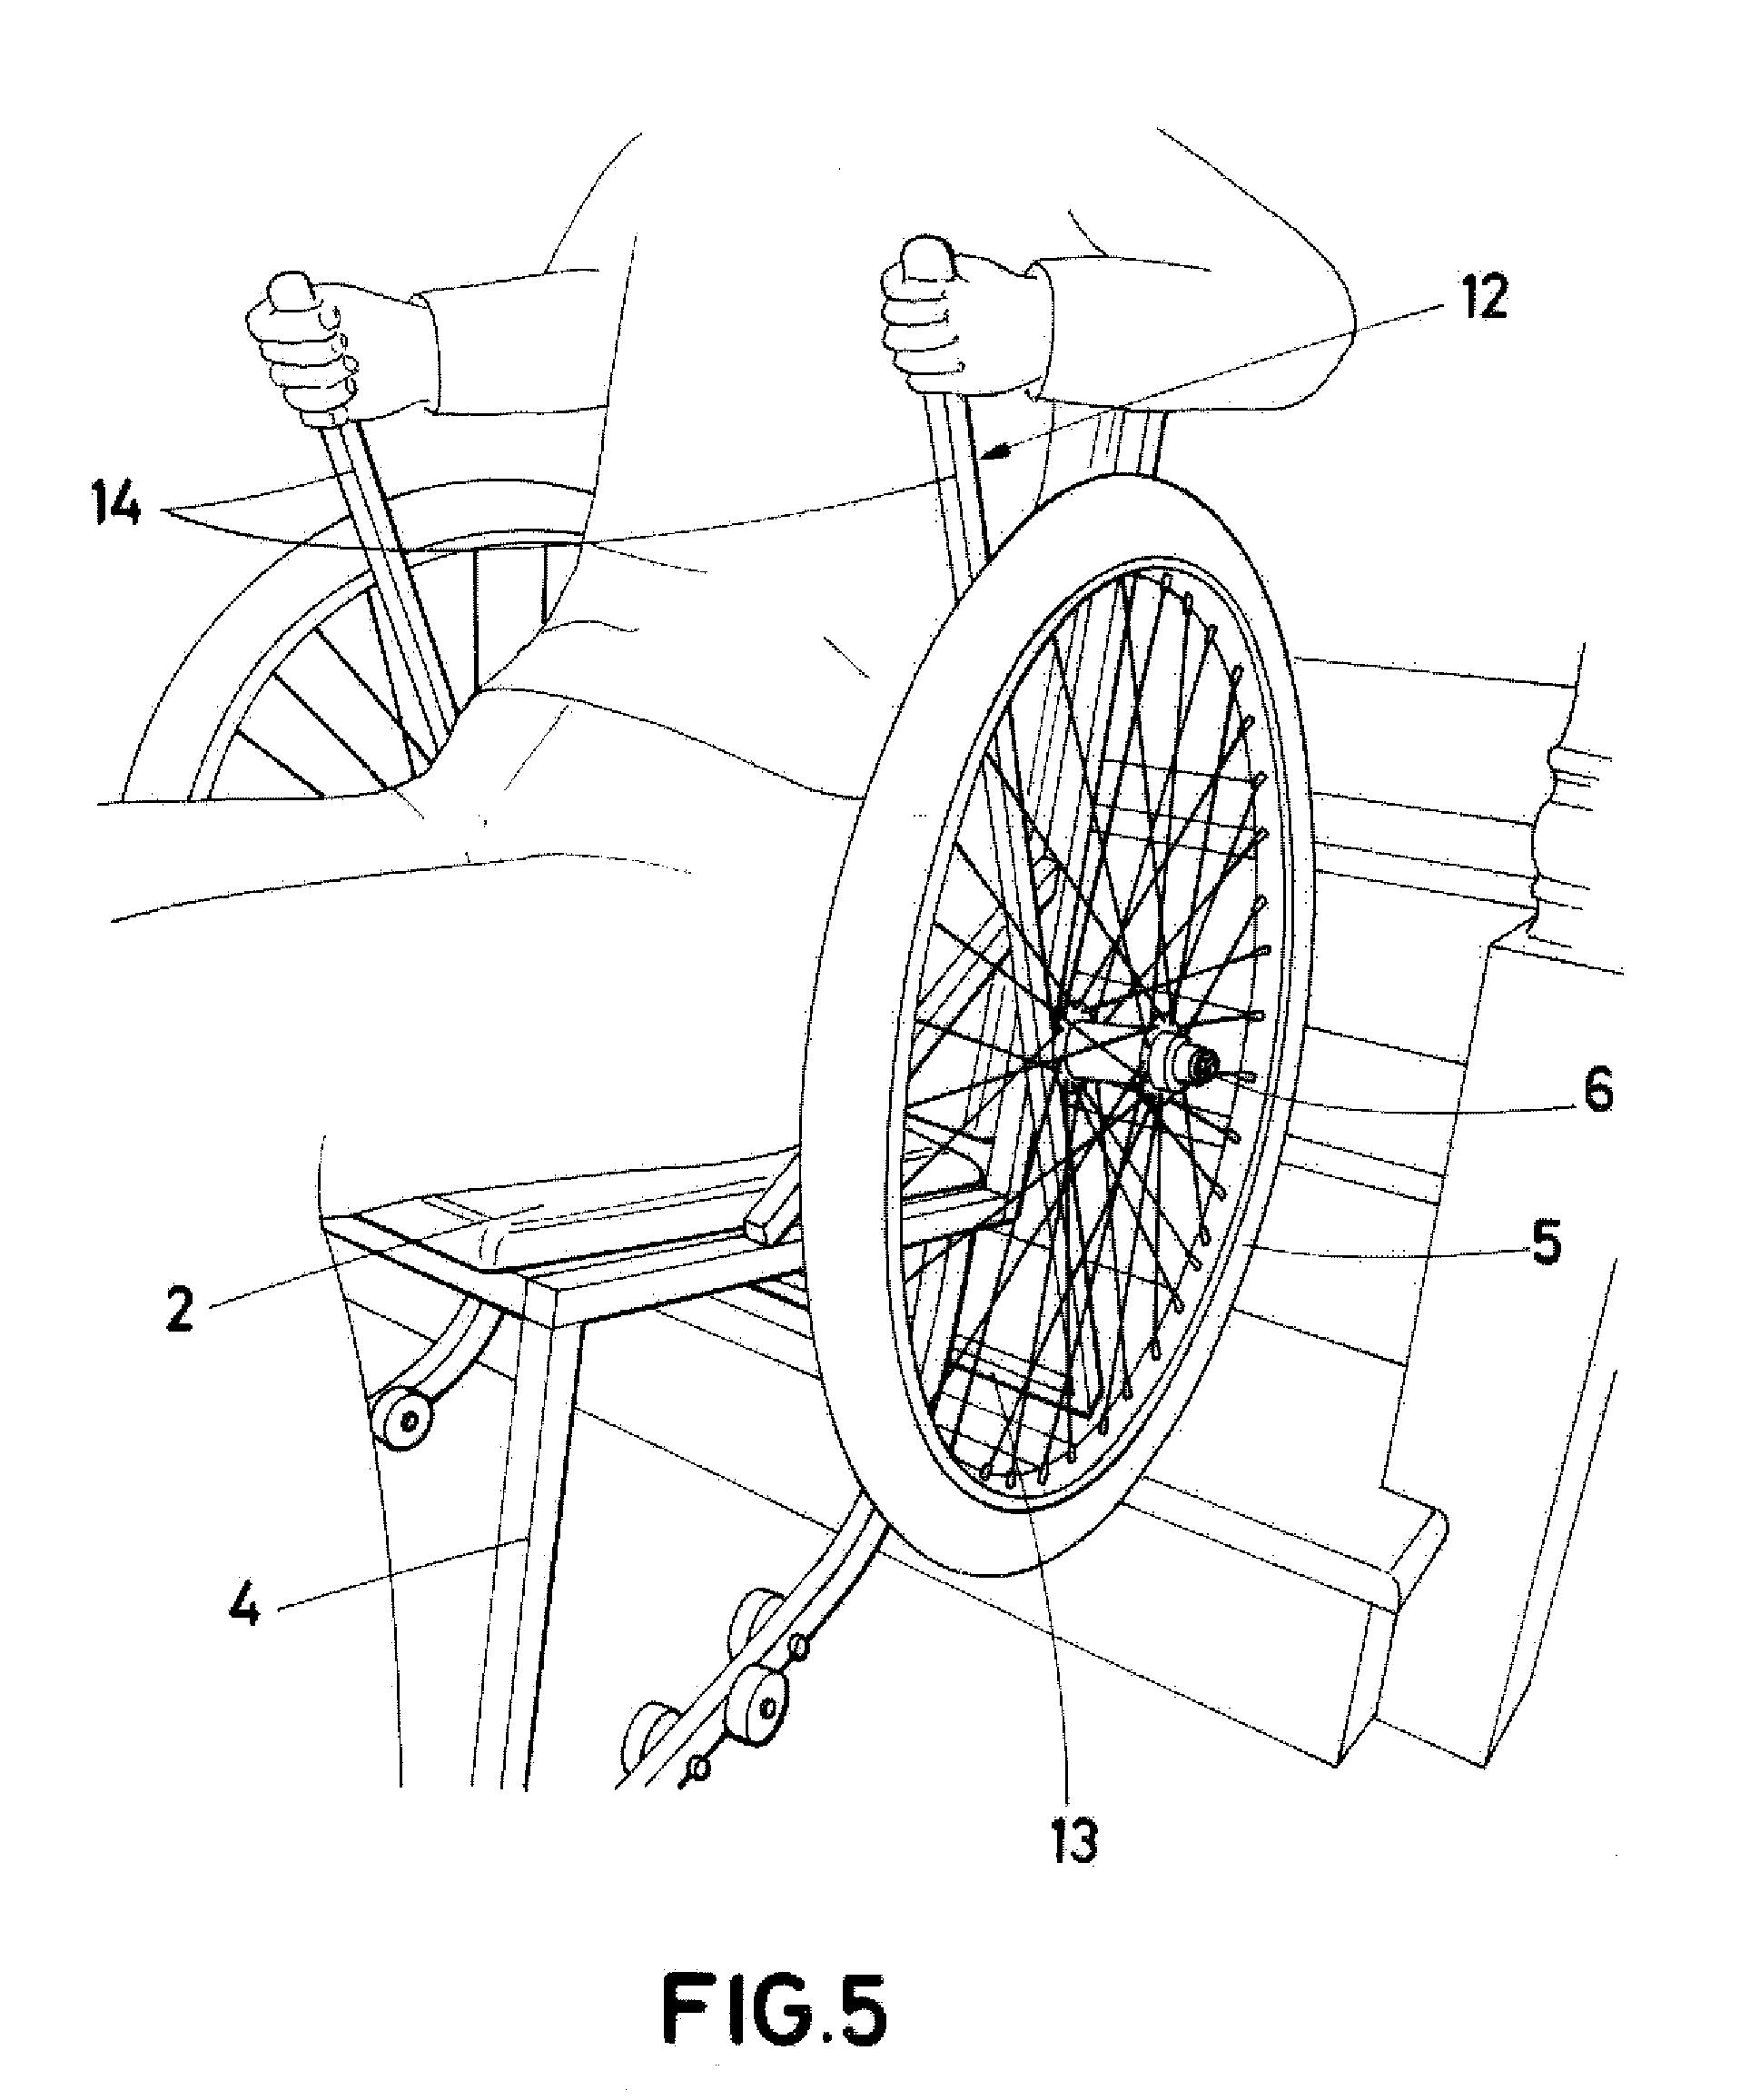 Patent WOA1 Silla de ruedas con mecanismo para subir